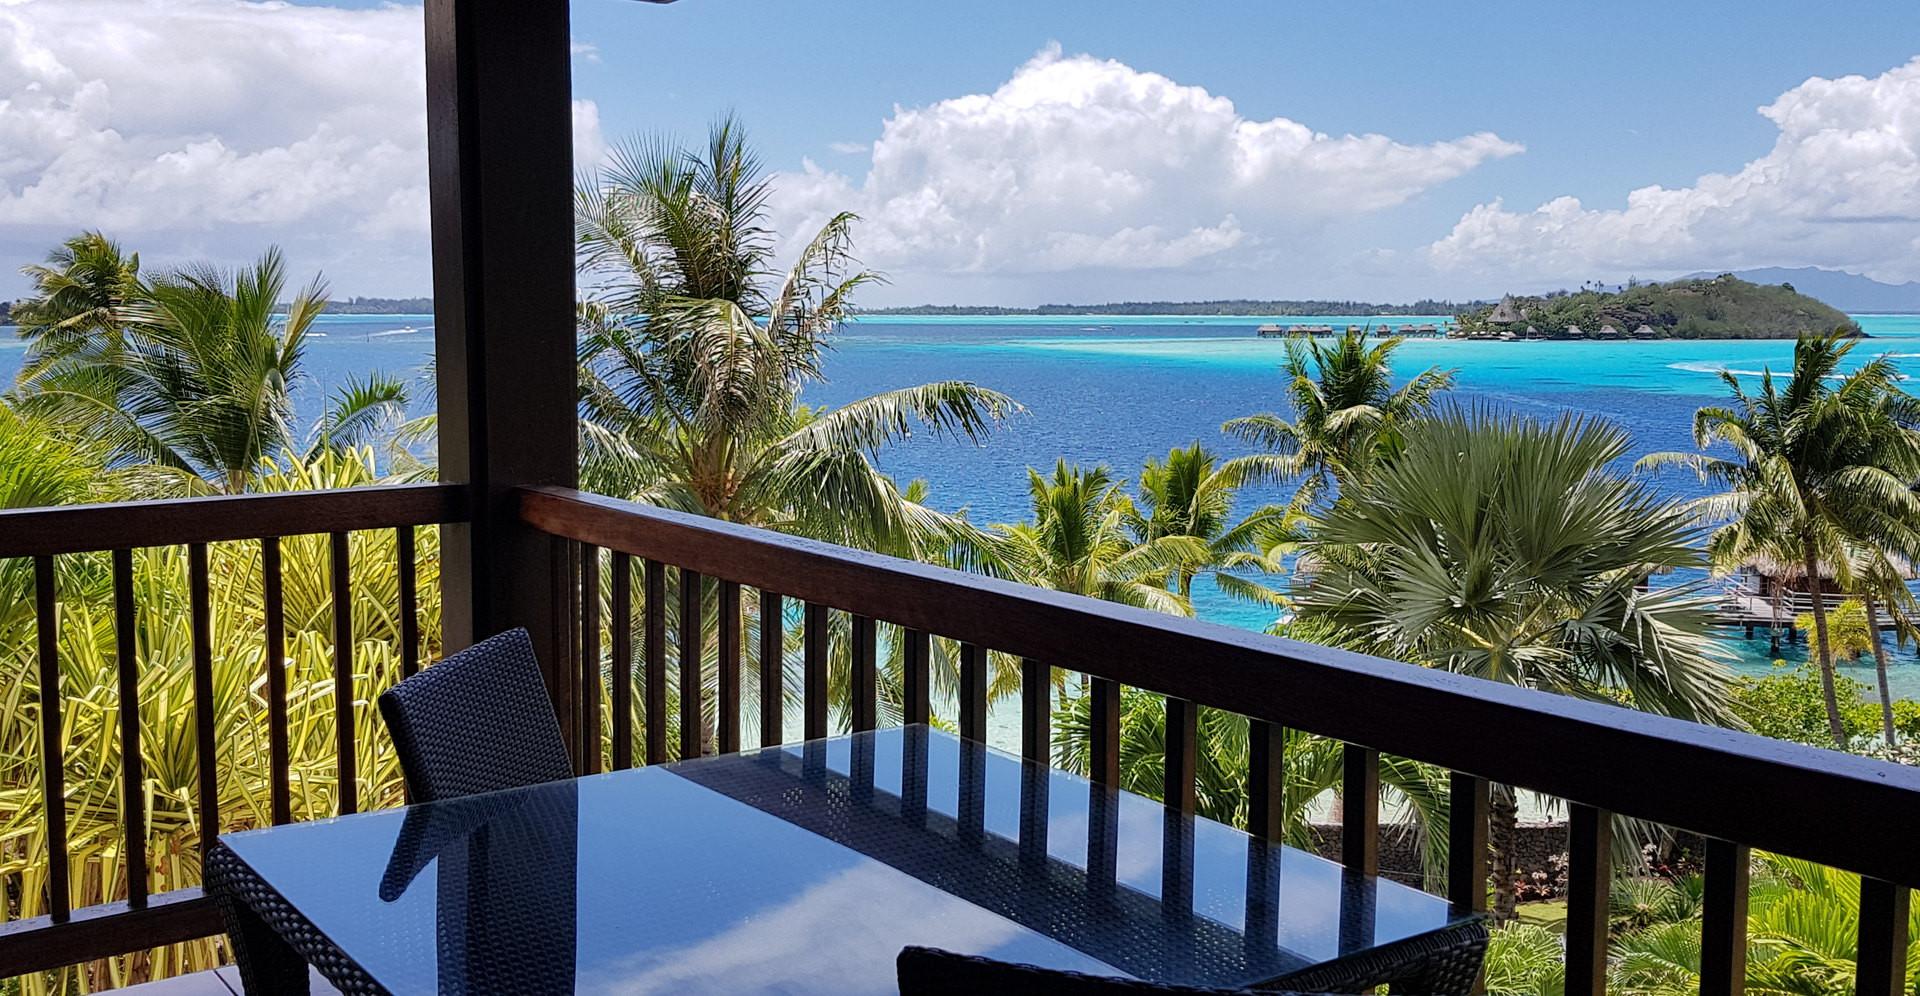 Maitai_Polynesia_Bora_Bora-Ocean_View_Room_Balkon